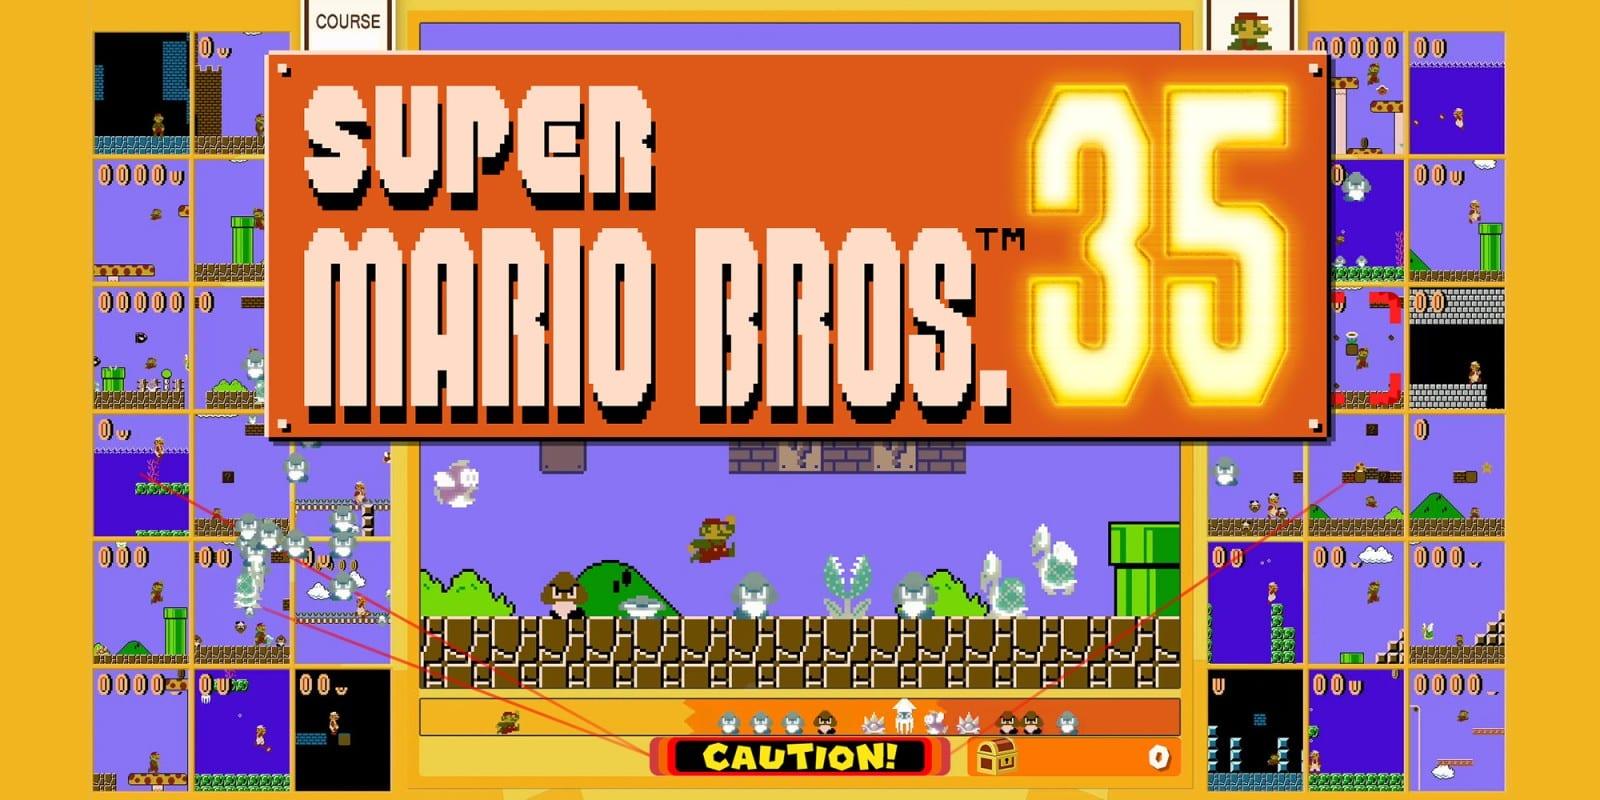 Super Mario Bros. 35 disponibile da oggi, gratis con Nintendo Switch Online